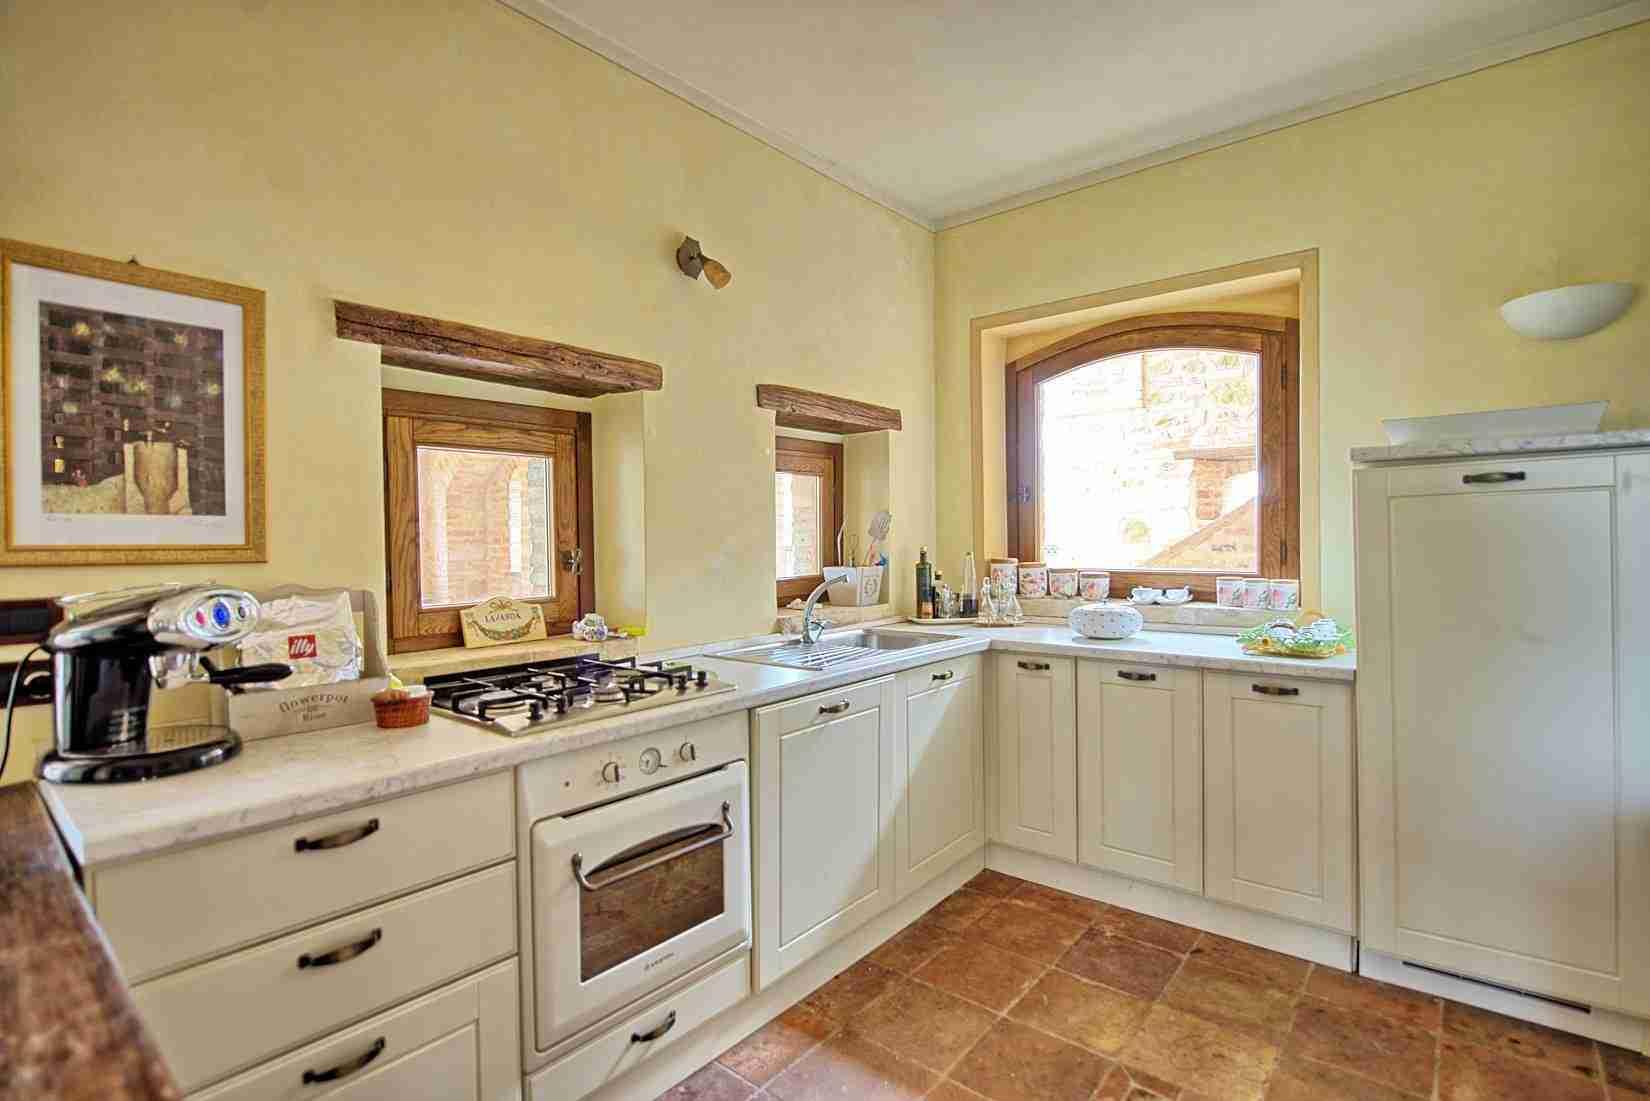 27 Assisi kitchen